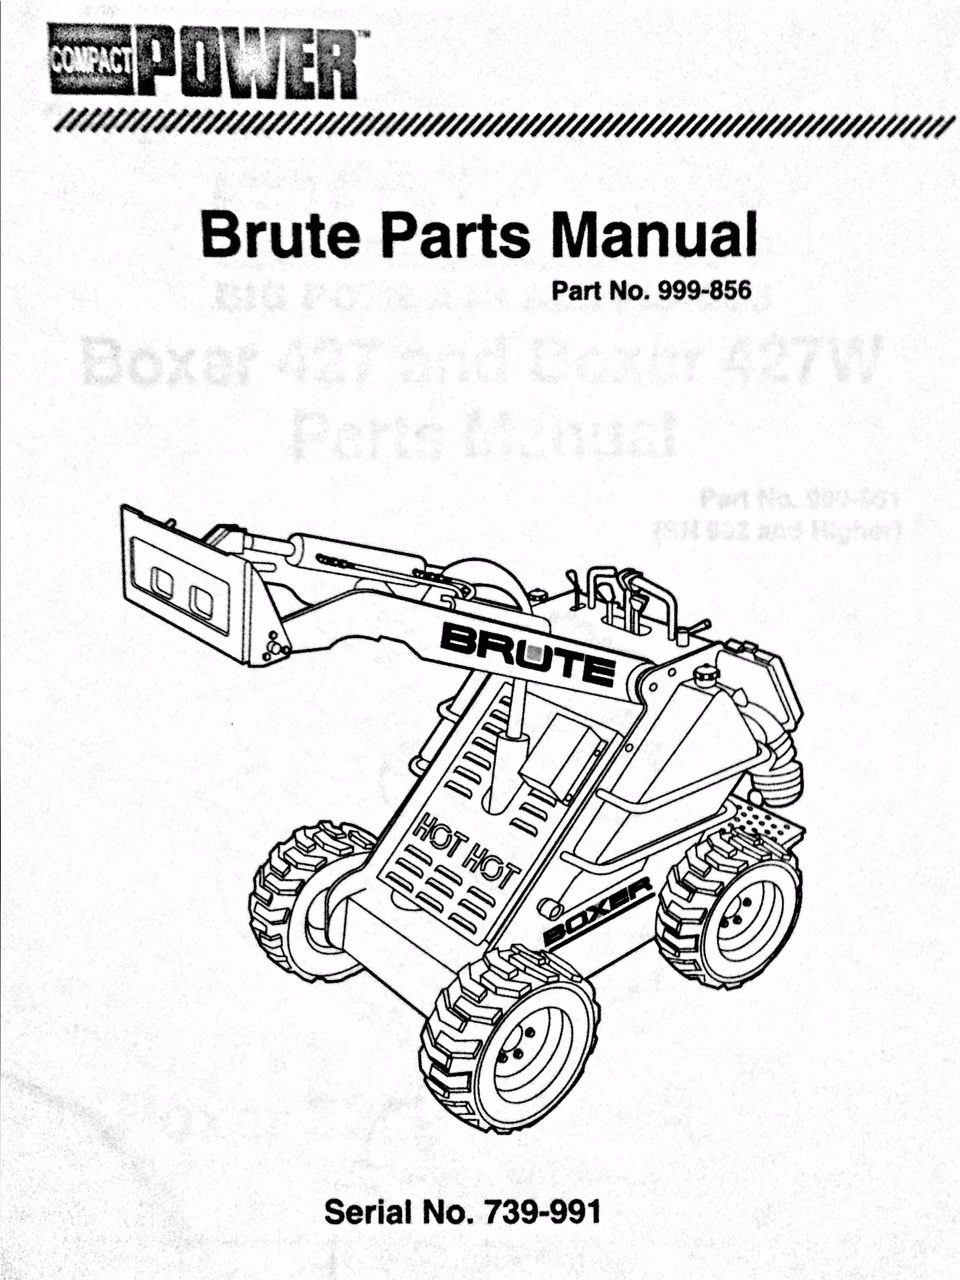 Boxer 427 Brute Parts Manual